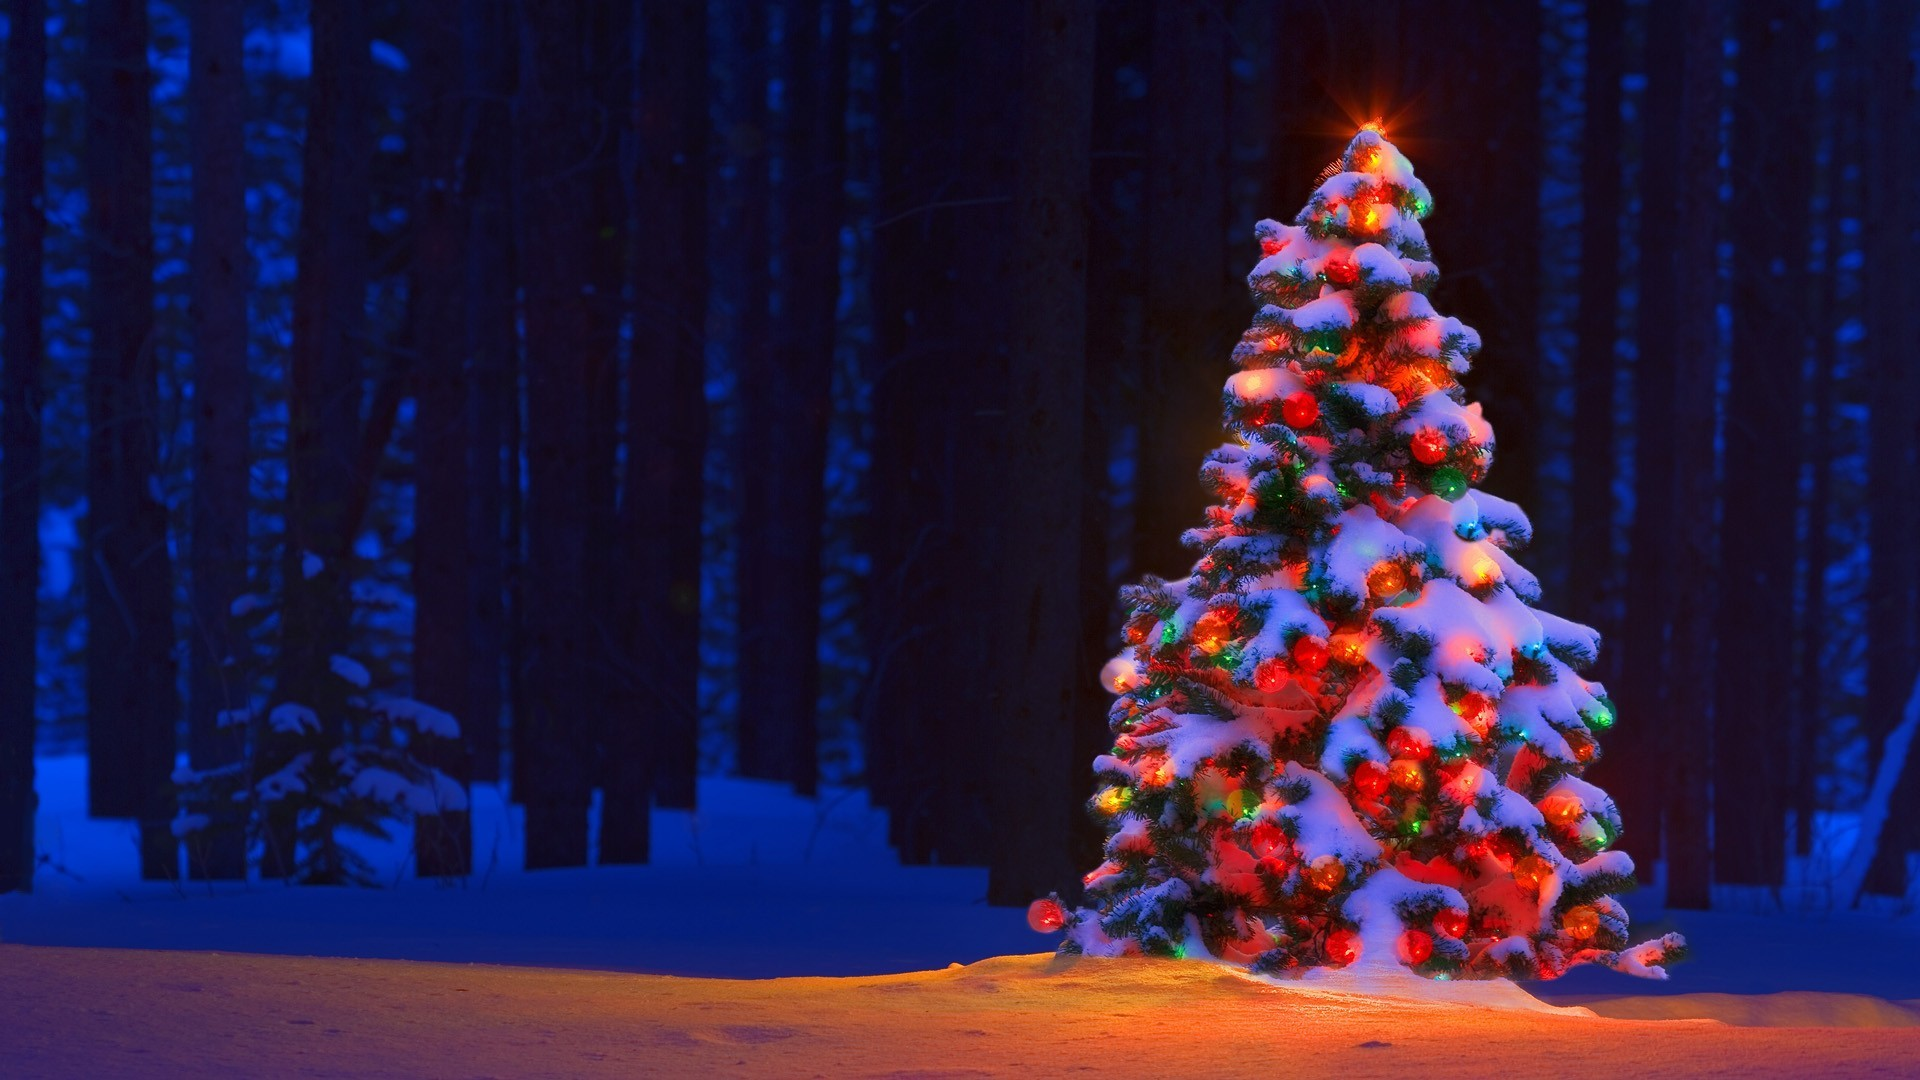 Christmas Tree Hd Wallpaper 73 Images